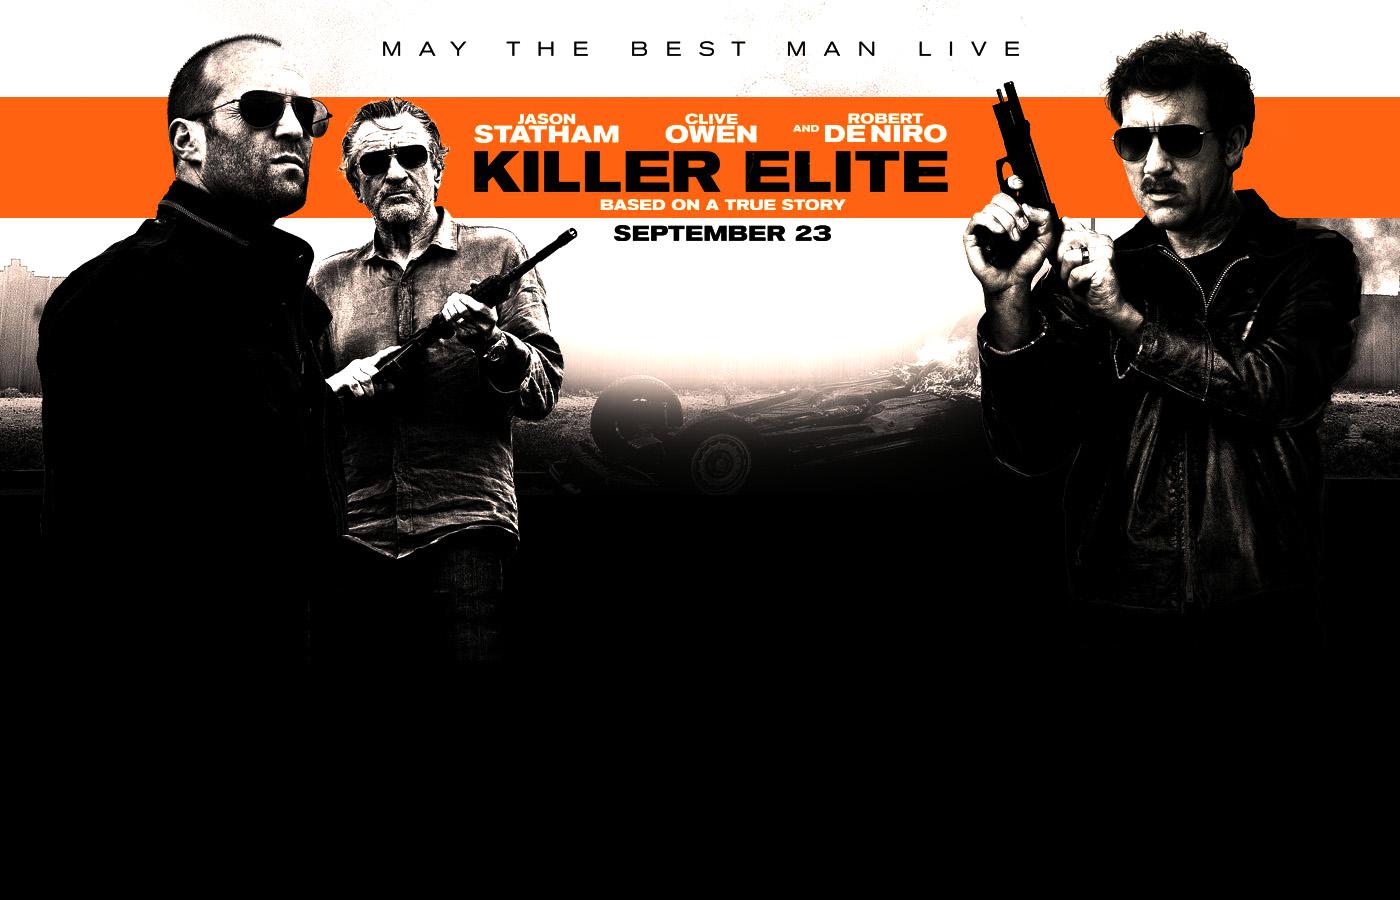 http://3.bp.blogspot.com/-qL9k4erDGac/Tneo4lpVOTI/AAAAAAAADKY/-OEDXhX4PqA/s1600/Killer_Elite_HD_Poster_Wallpaper_Vvallpaper.Net.jpg